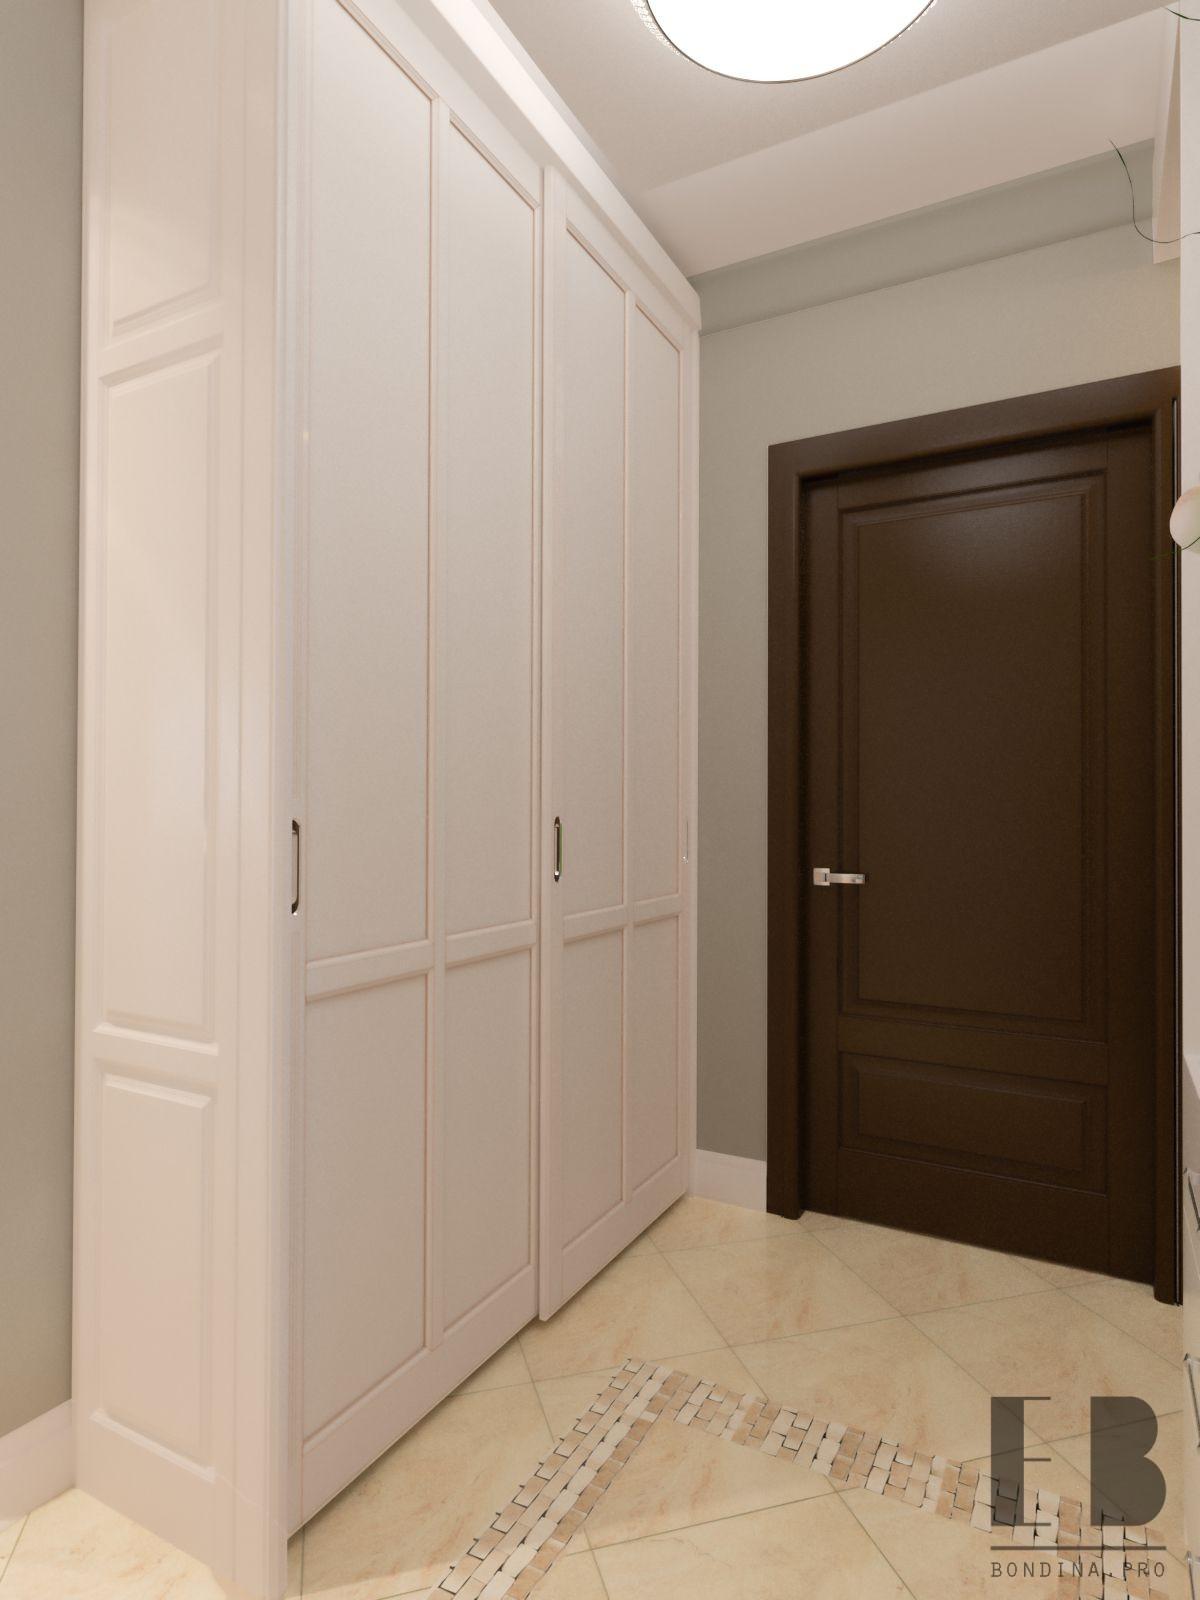 Hallway design with a large closet